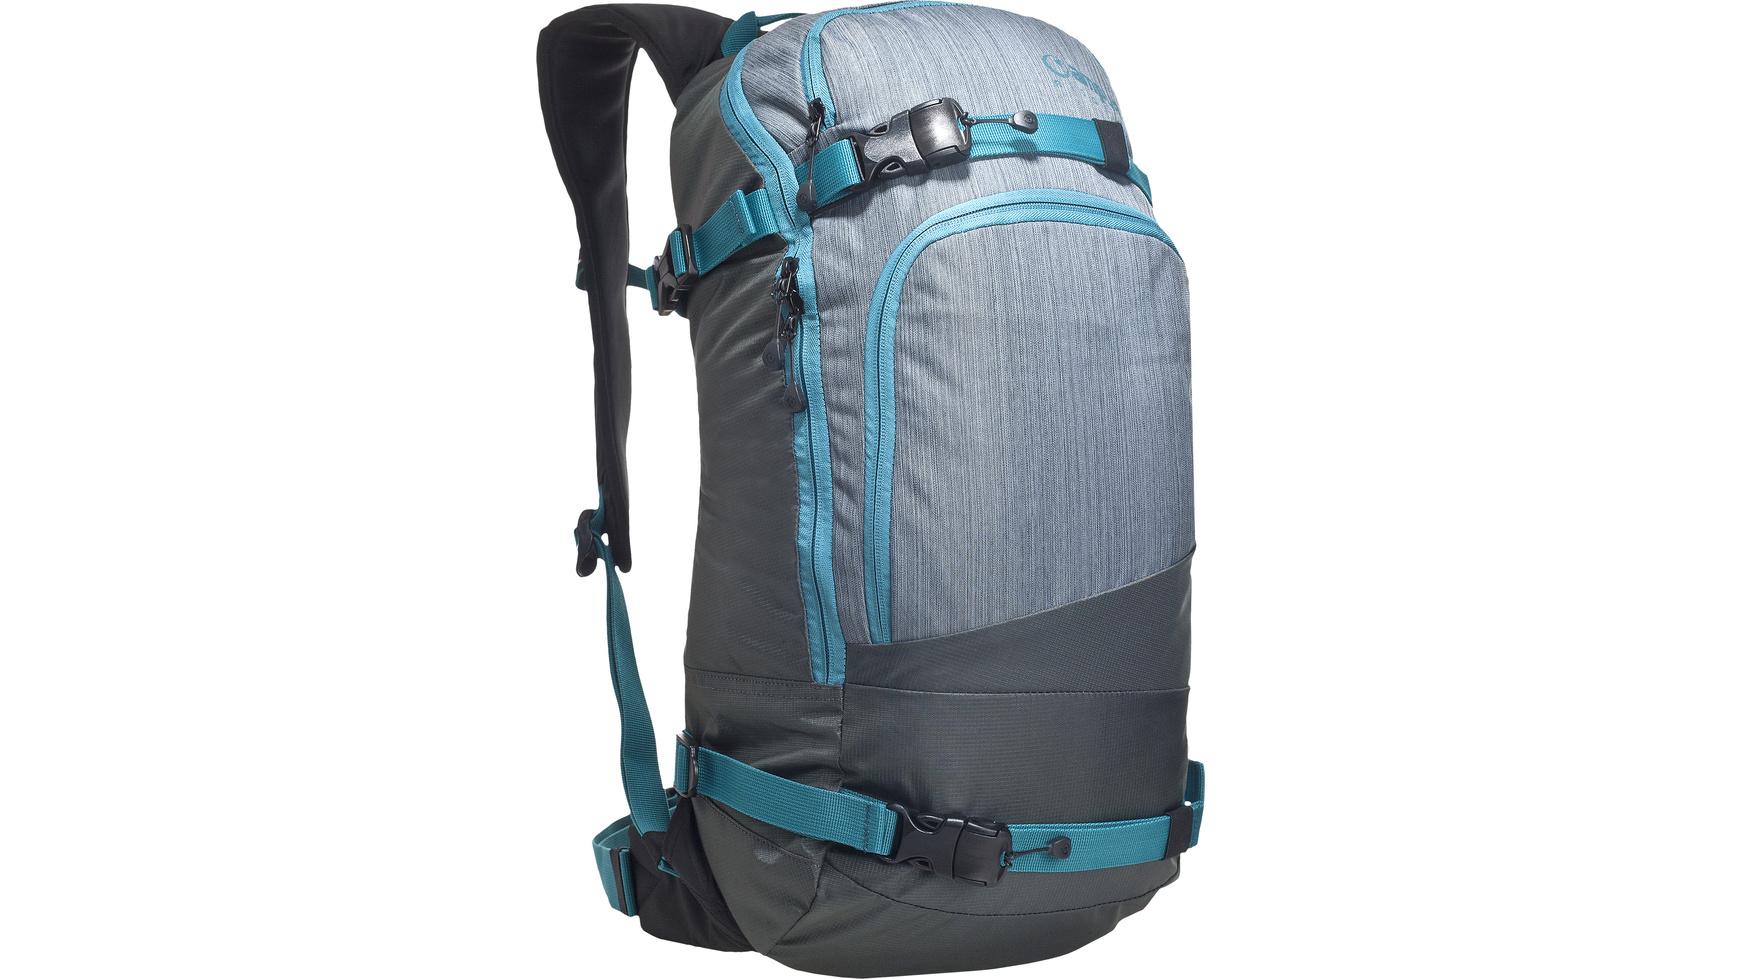 282020003-amplifi-ridge-pack-27l-ultramarine-main